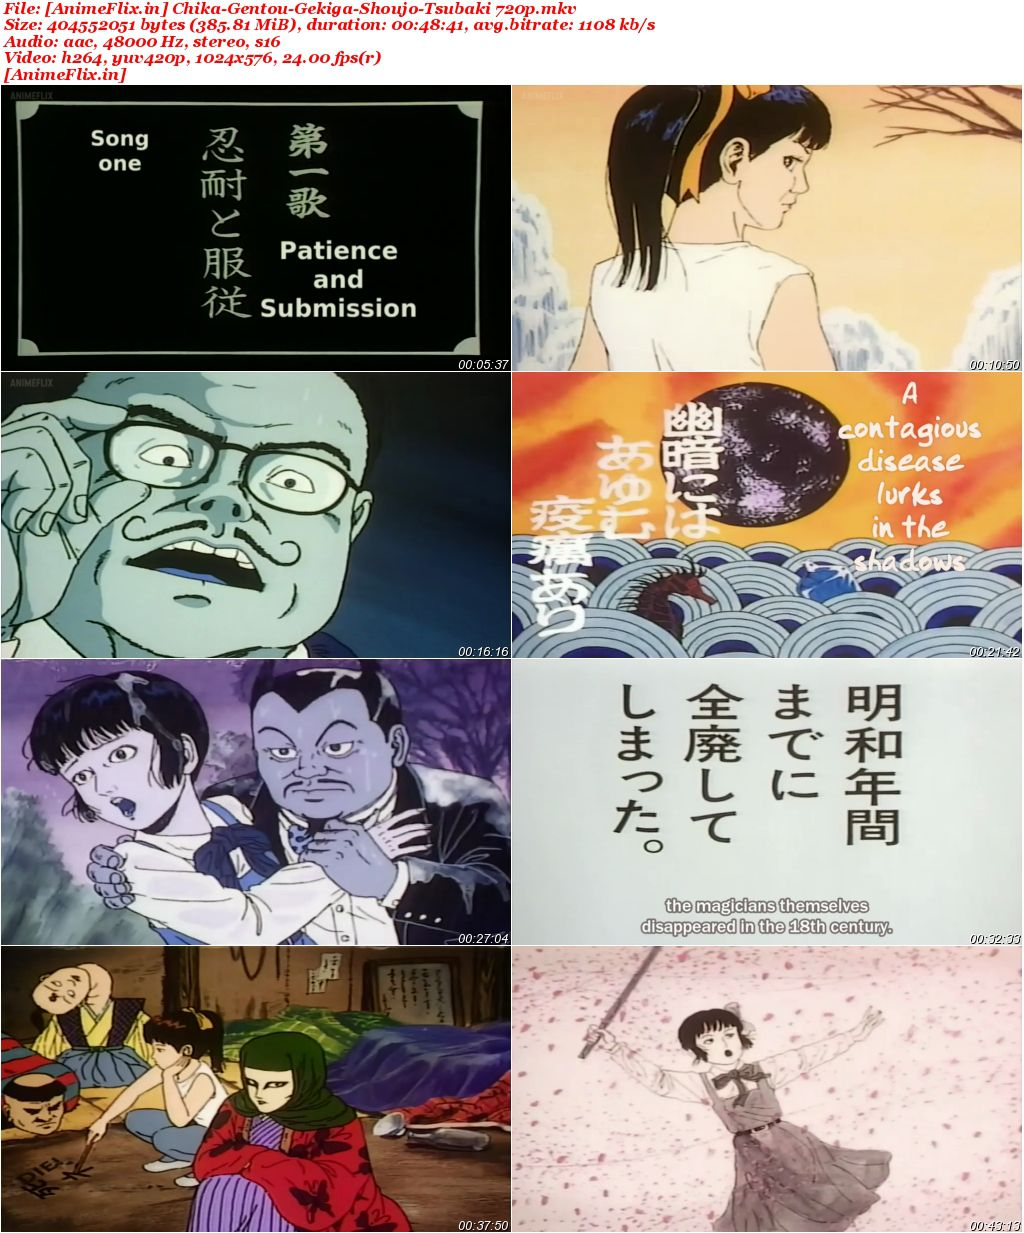 Anime-Flix-in-Chika-Gentou-Gekiga-Shoujo-Tsubaki-720p